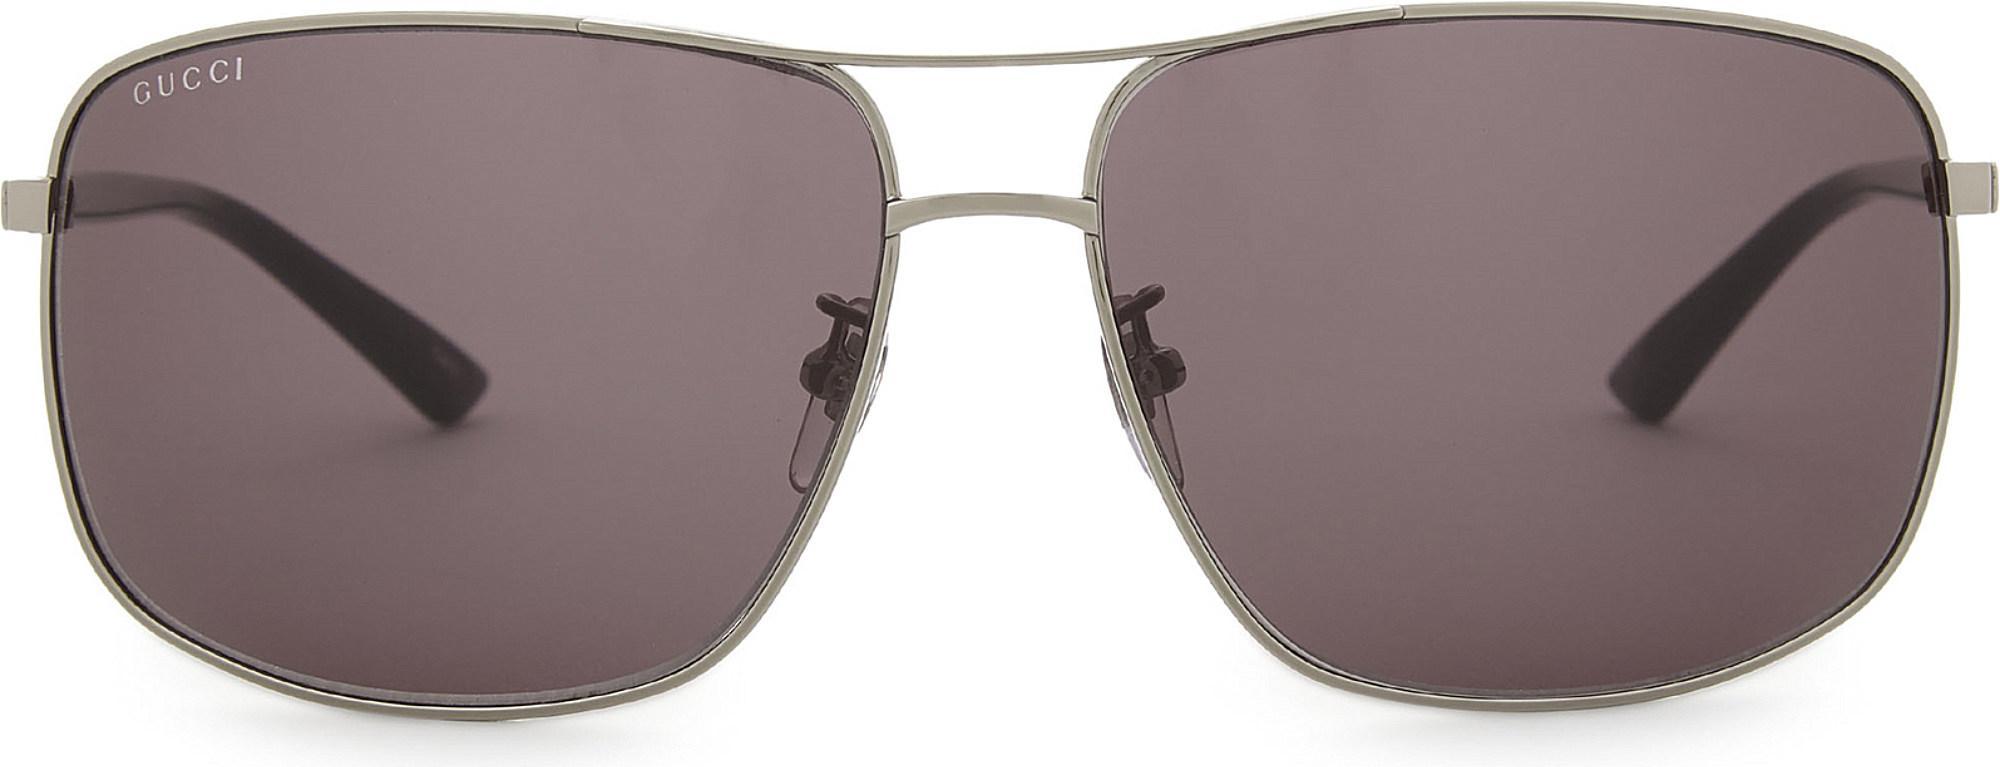 74546a58eed Gucci - Multicolor Gg0065sk Square-frame Sunglasses - Lyst. View fullscreen